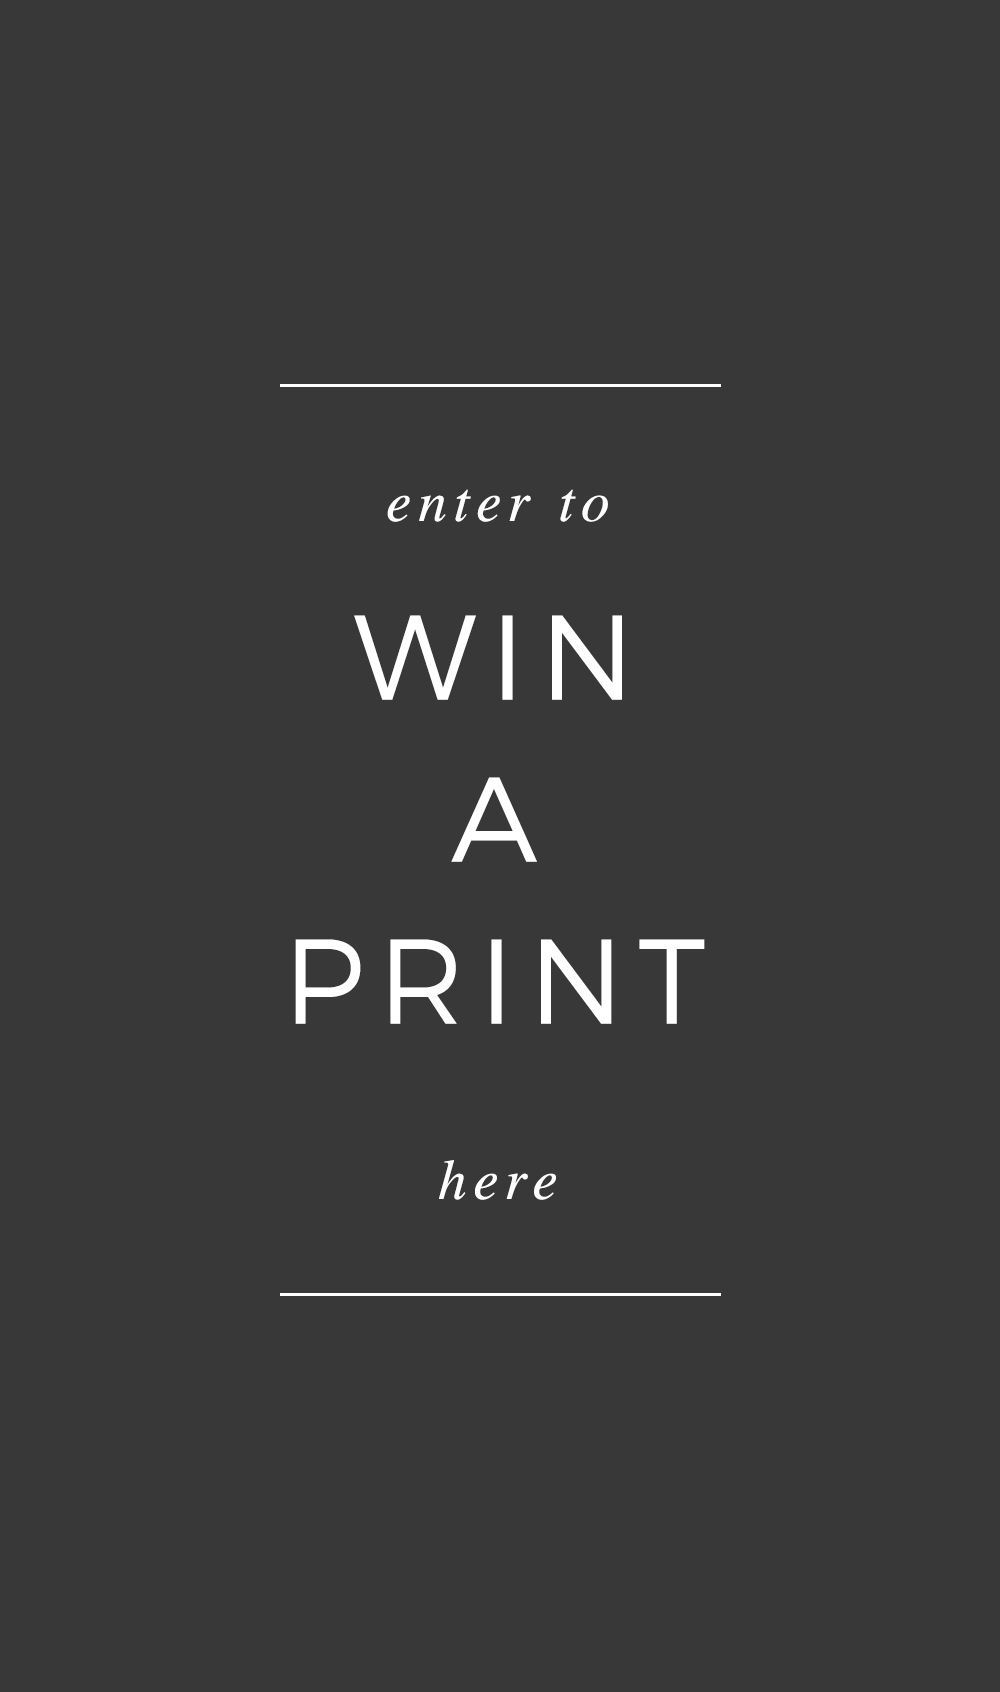 win-a-print.png